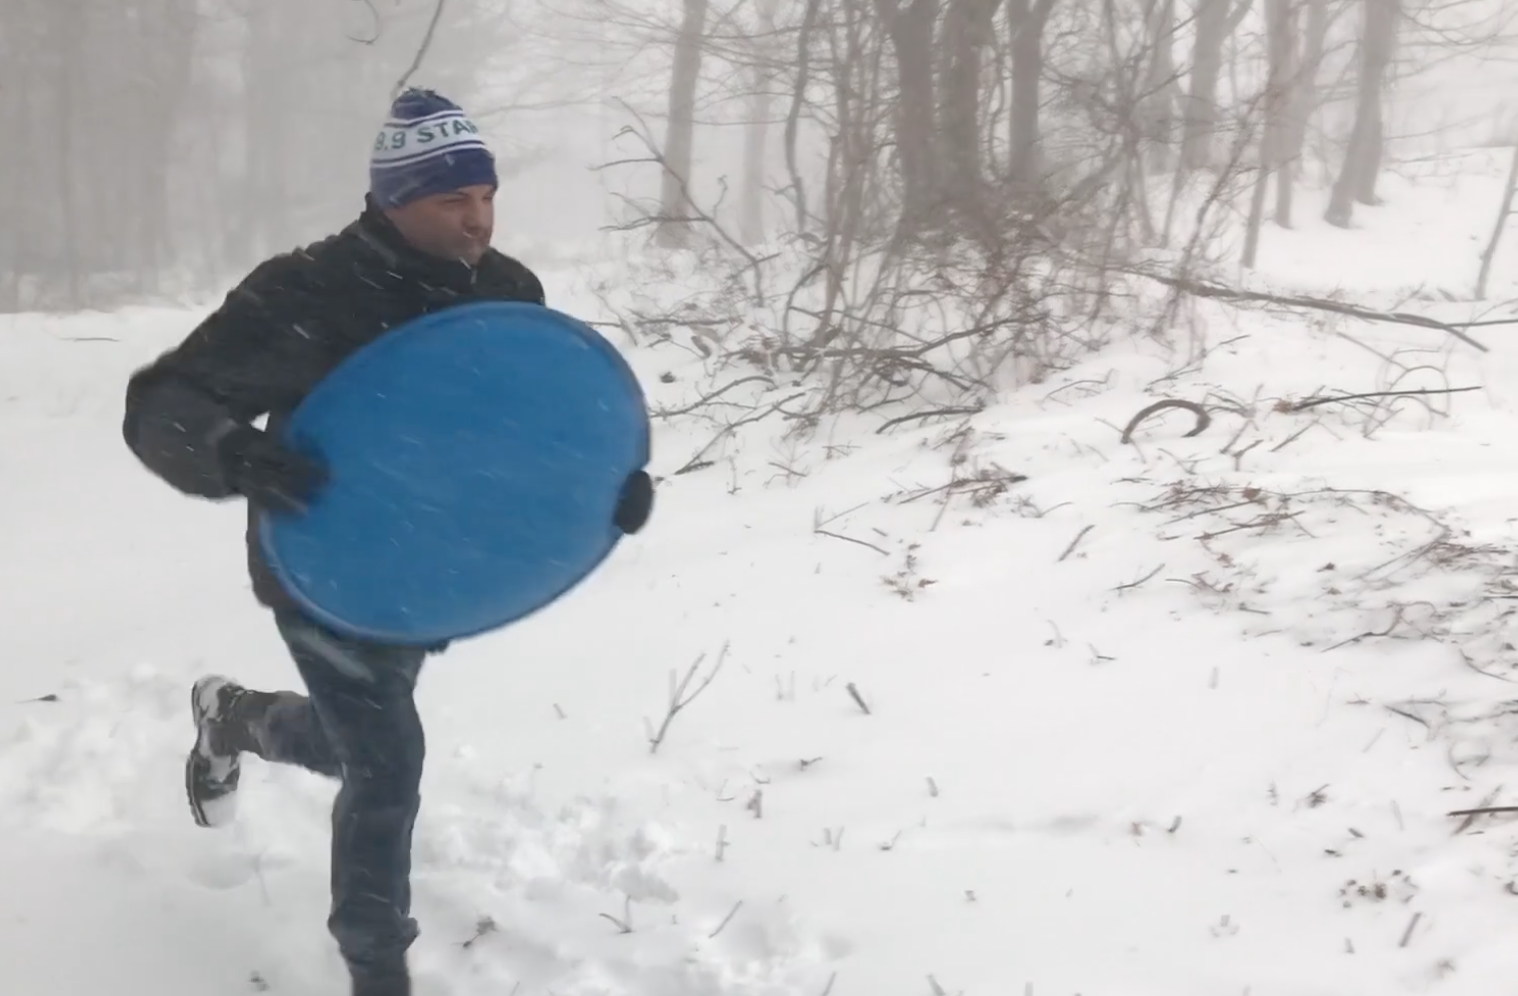 60 Seconds Behind the Scenes- Raven's sledding adventure